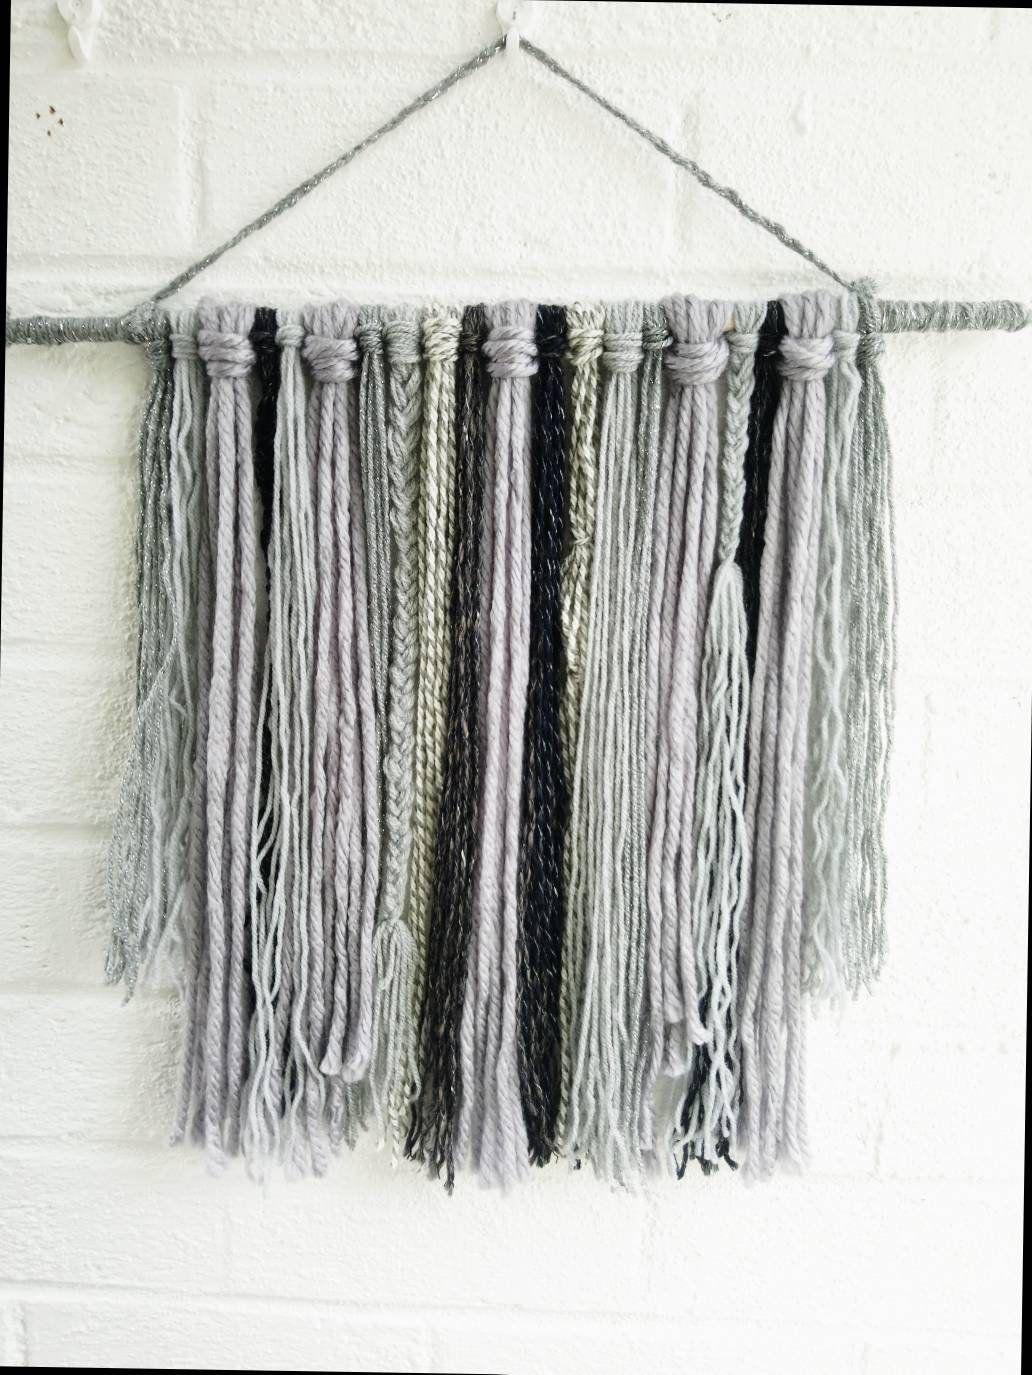 Wool wall hangingmacrameyarn wall decorwall arthome decorrustic